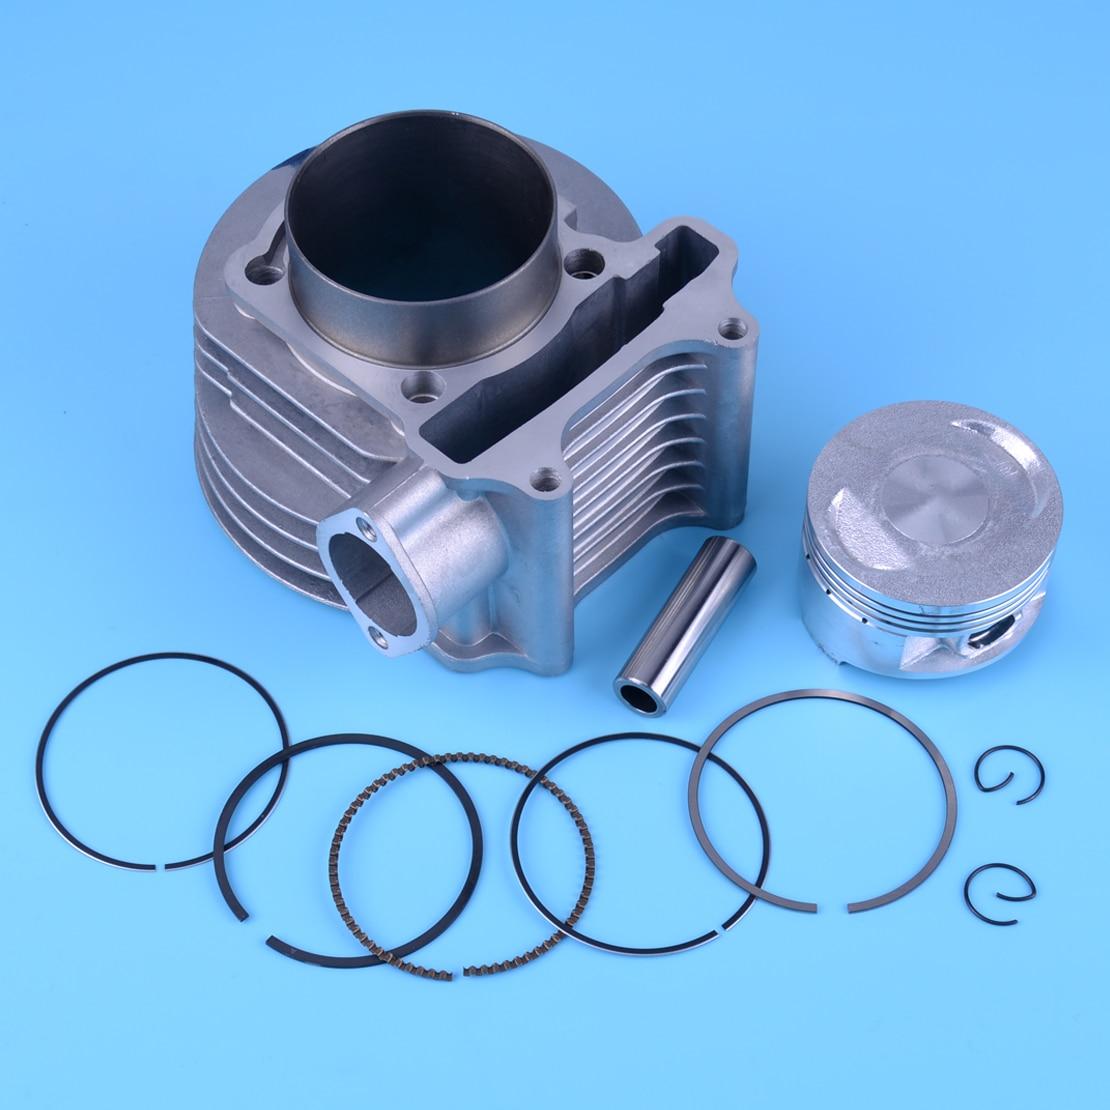 Beler Moto Cylindre 61mm Piston e-ring Joint 12 pièces Kit adapté pour GY6 125CC 150CC Scooter ATV